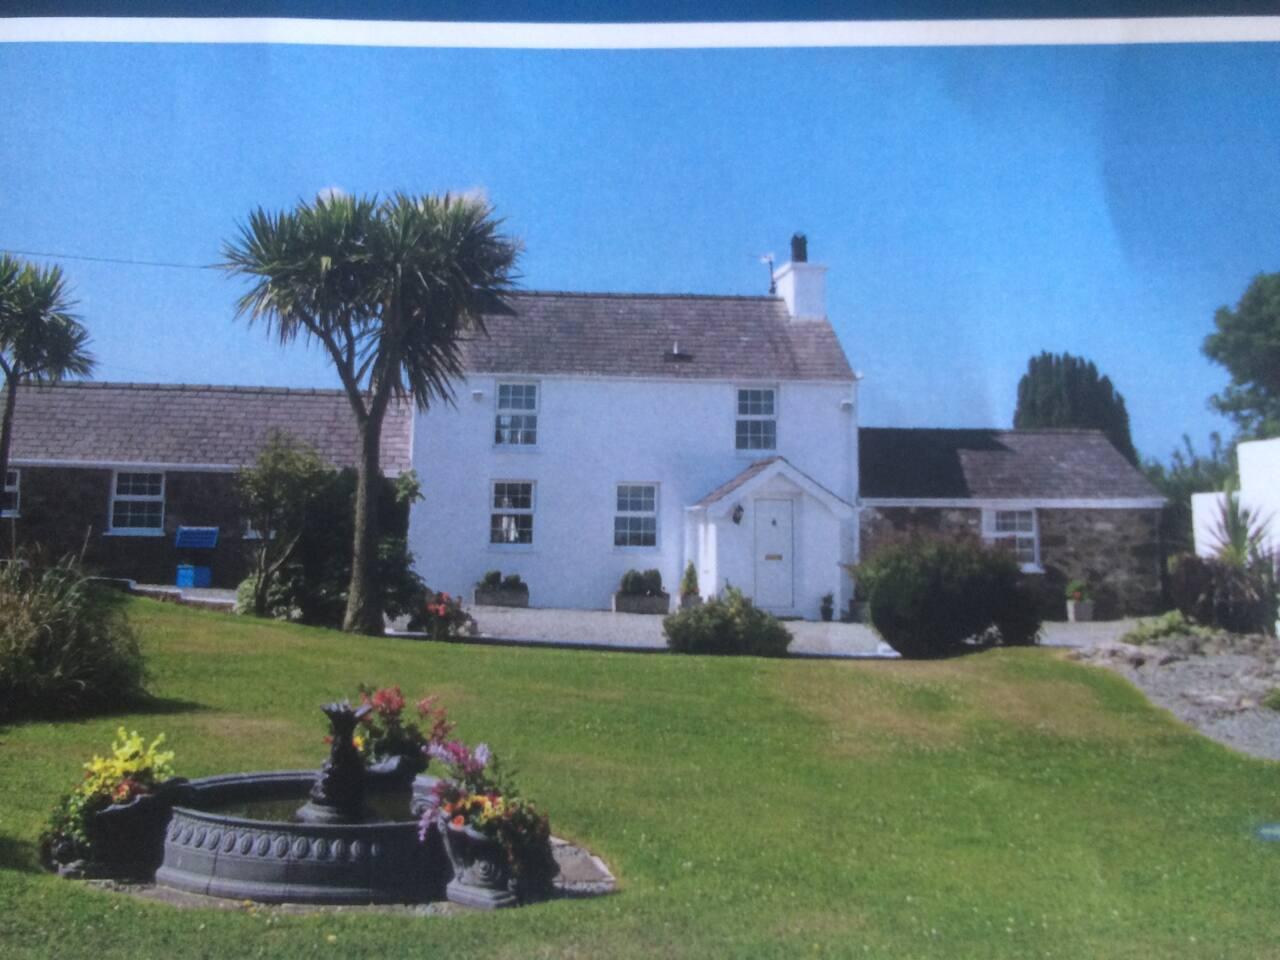 Penrallt House, Llynfaes, Anglesey